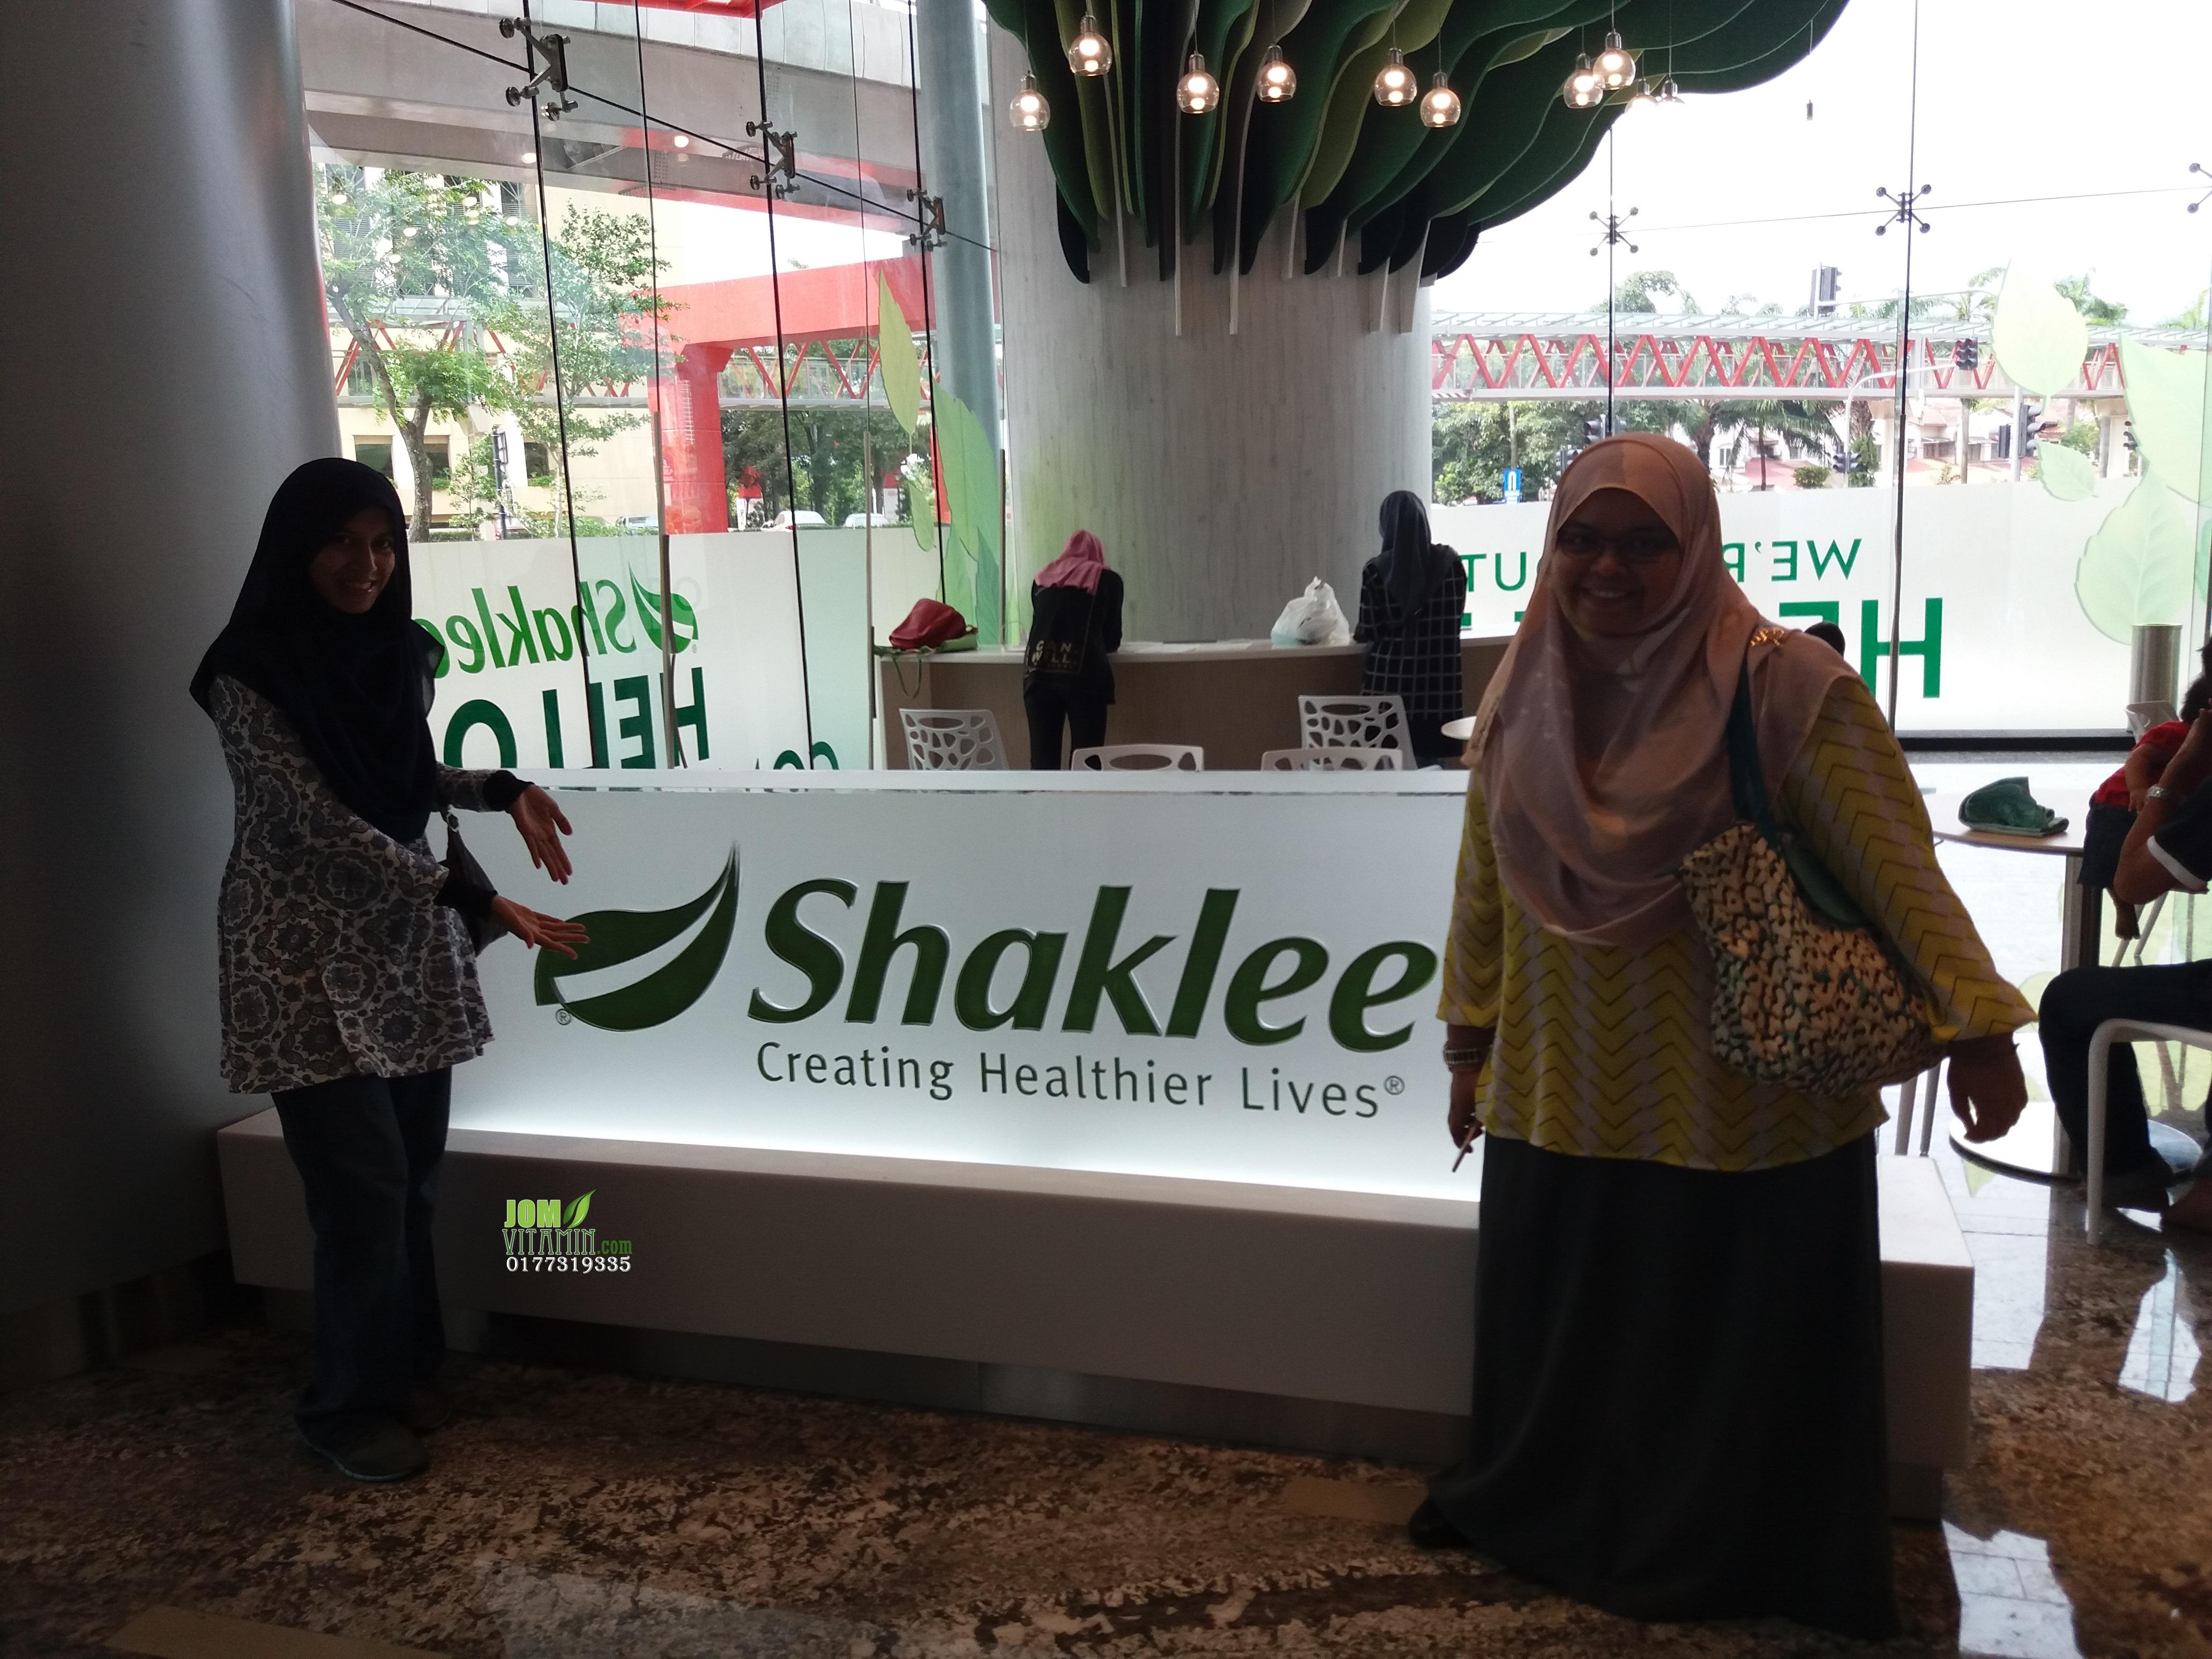 pengedar shaklee Malaysia 0177319335 shaklee branch sunway geo tower